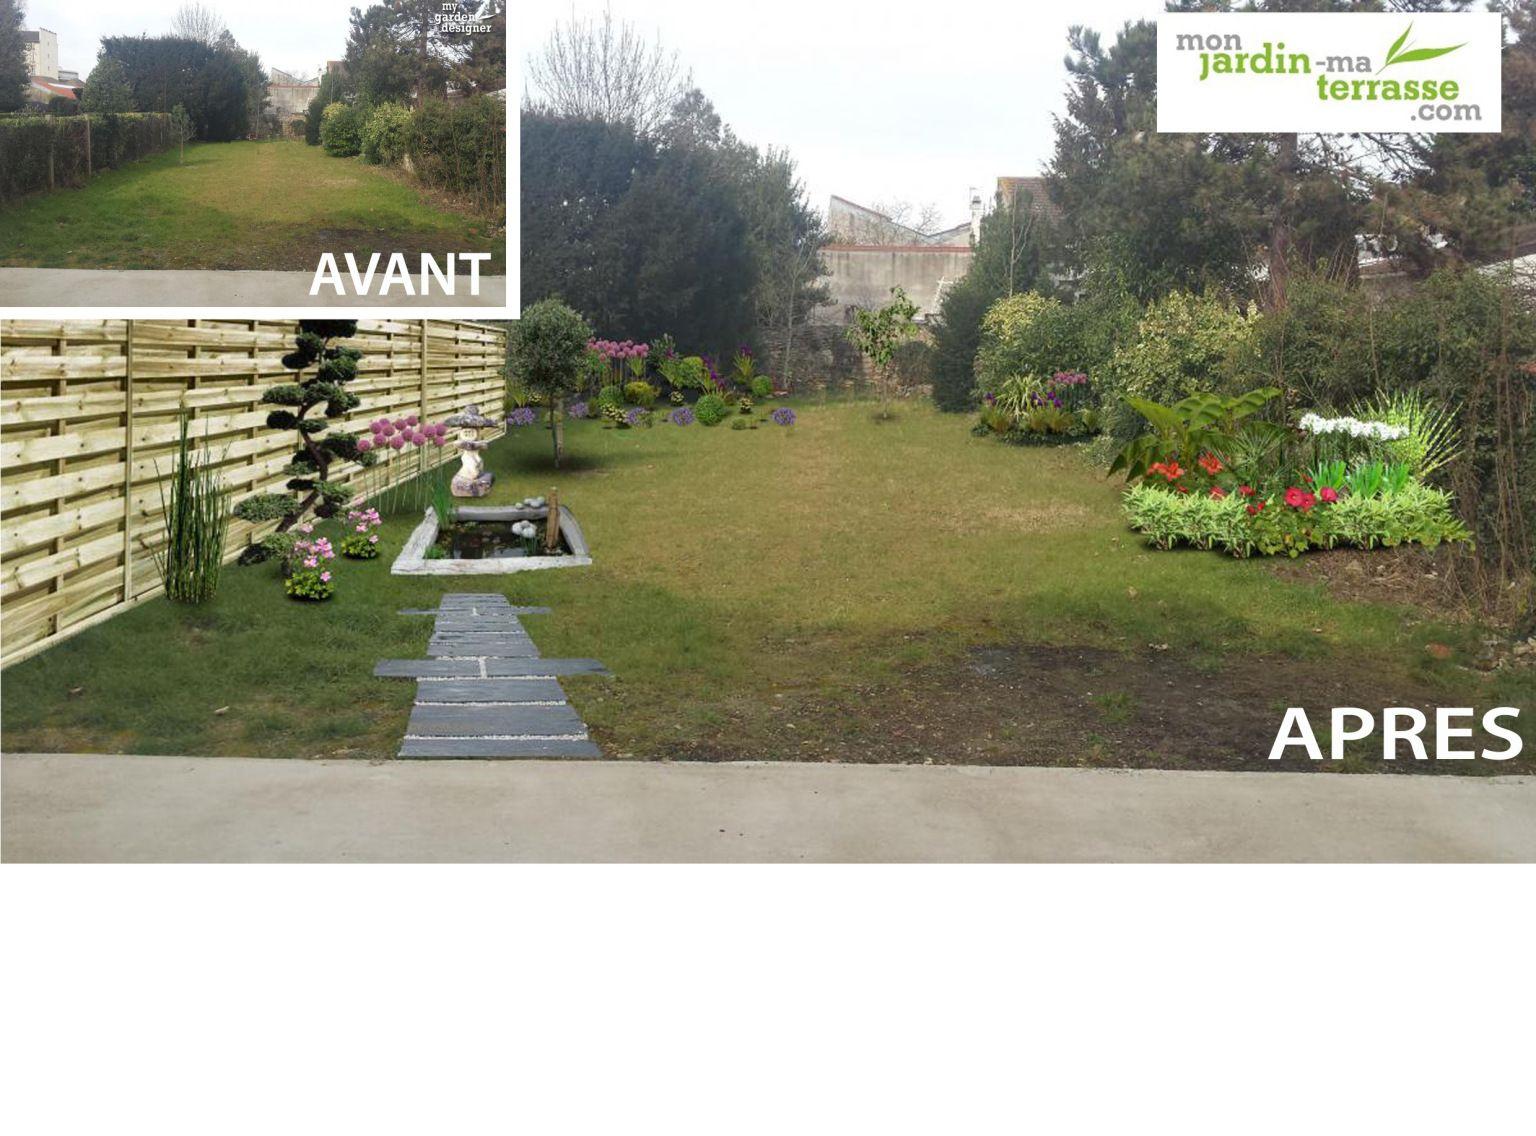 Amenager Un Jardin Japonais Amenagement Jardin Jardins